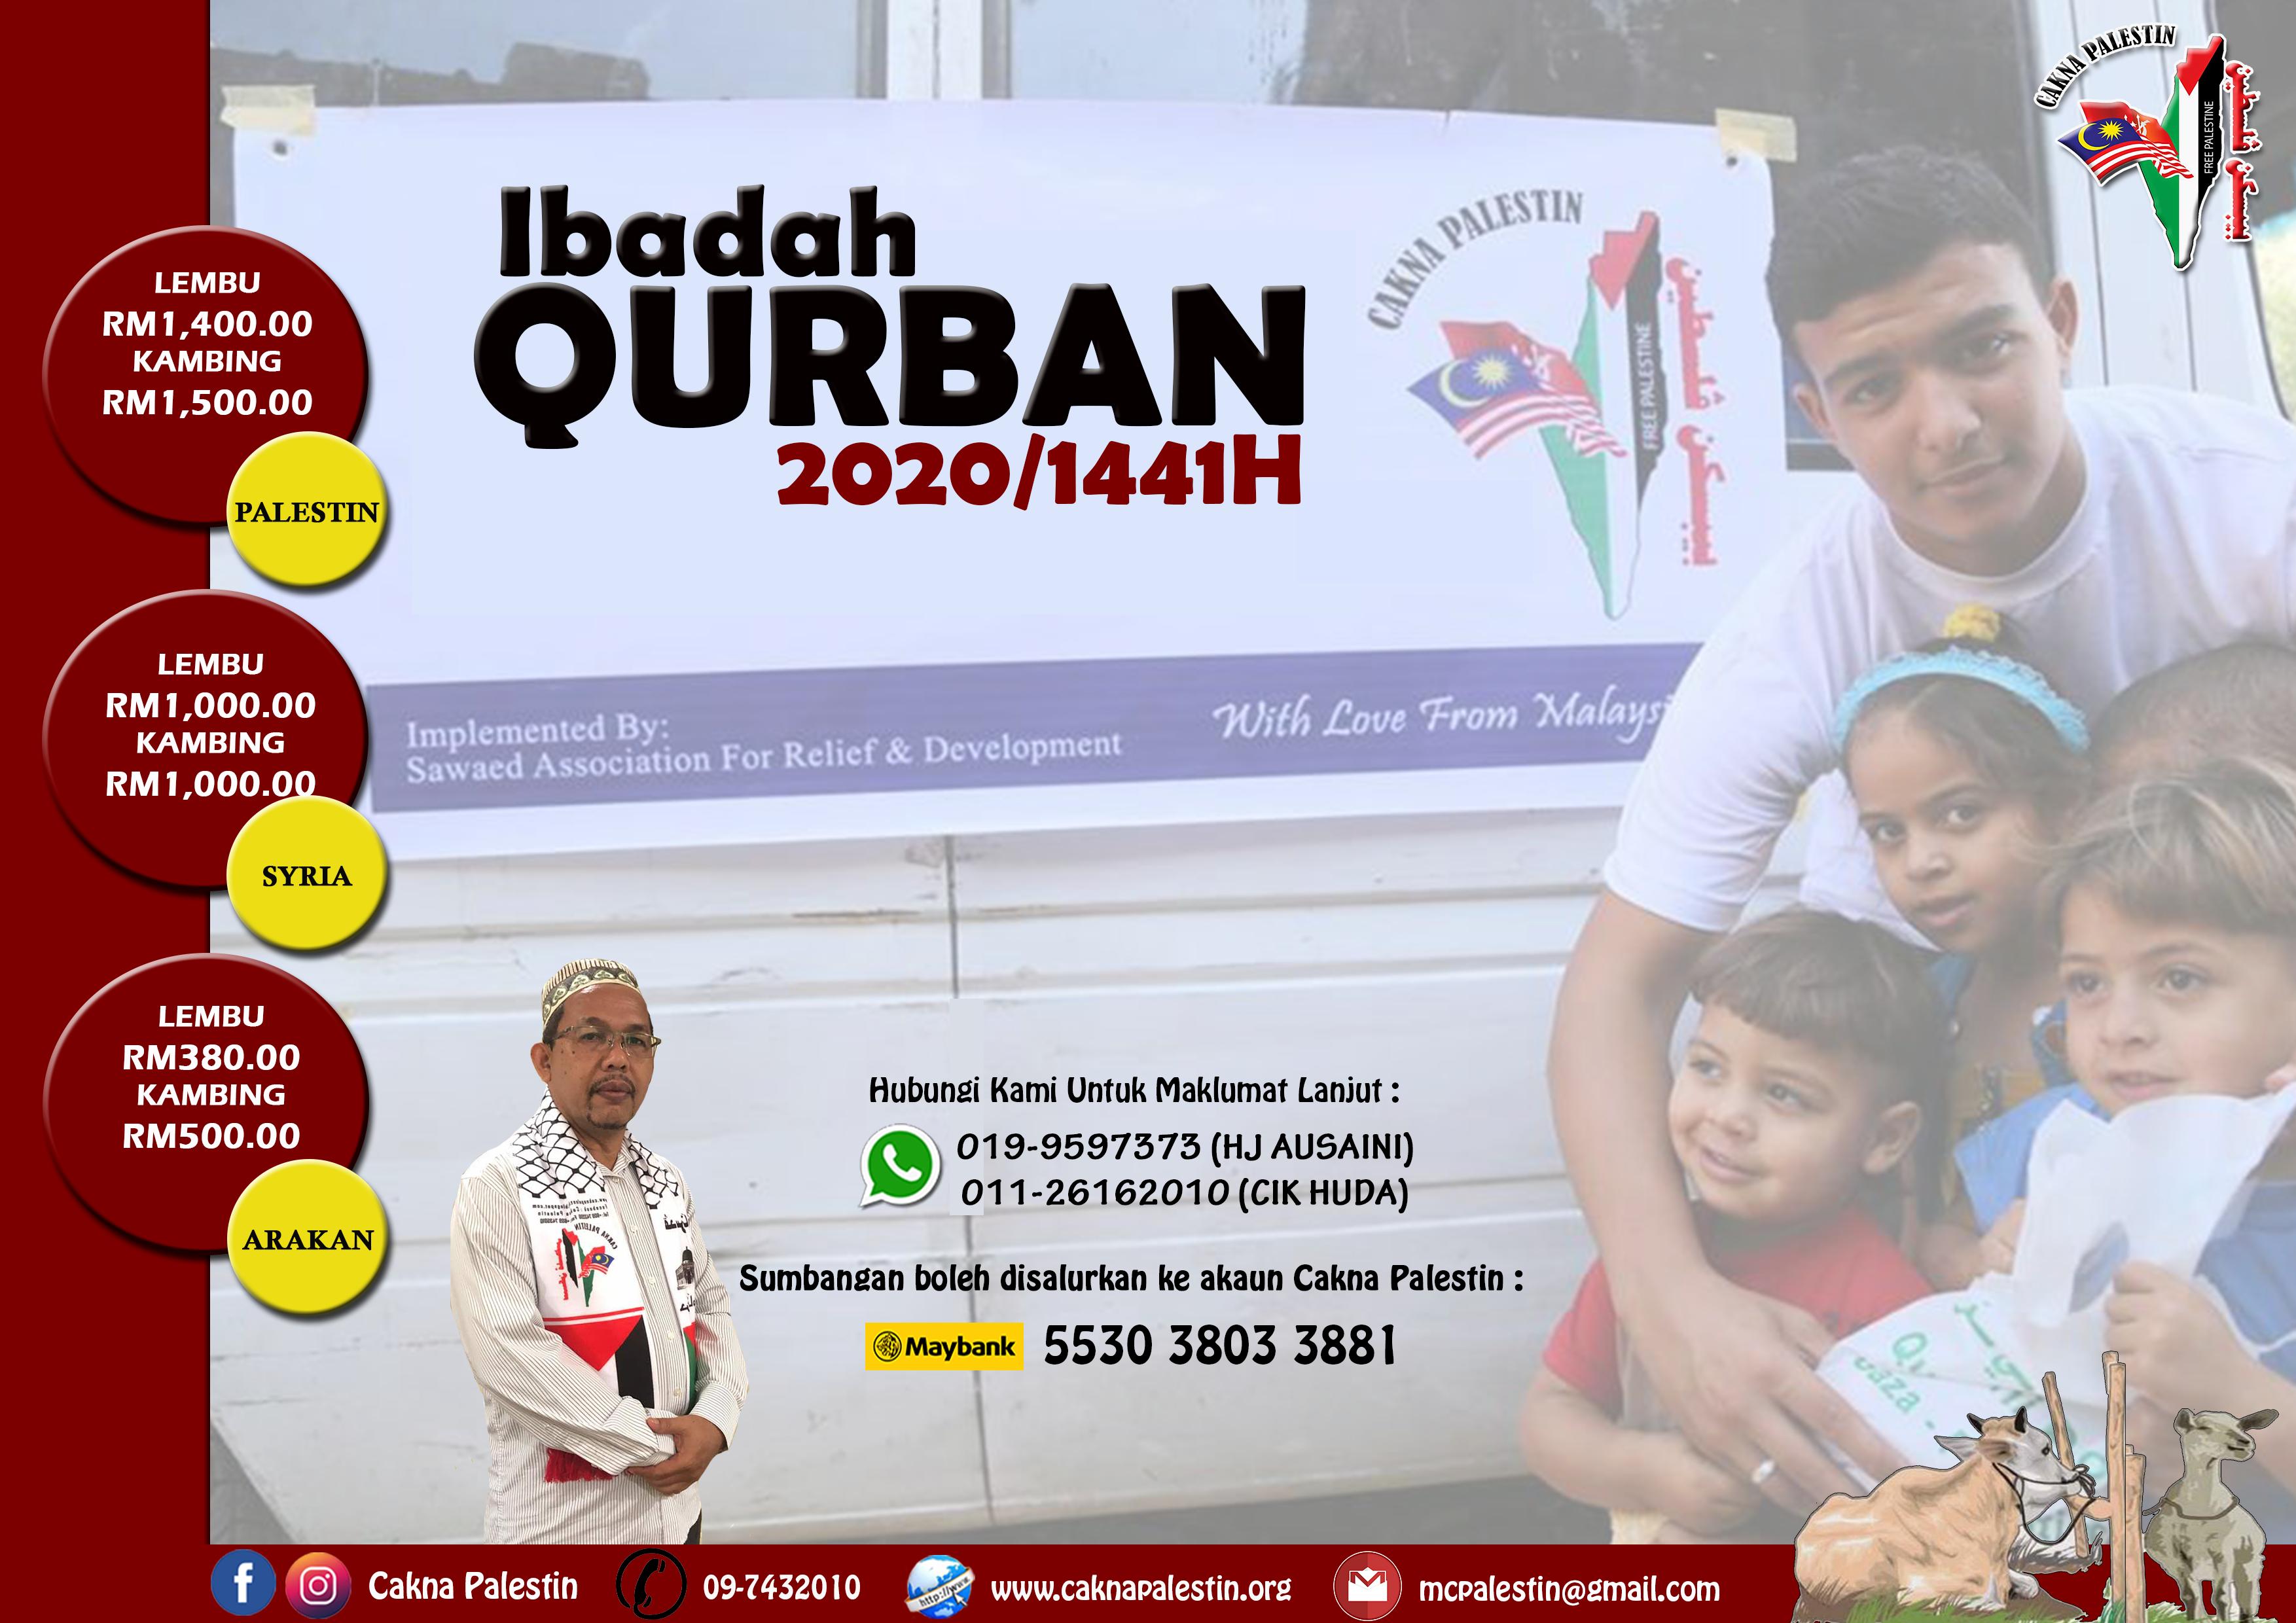 IBADAH QURBAN 2020 DI PALESTIN, SYRIA & ARAKAN